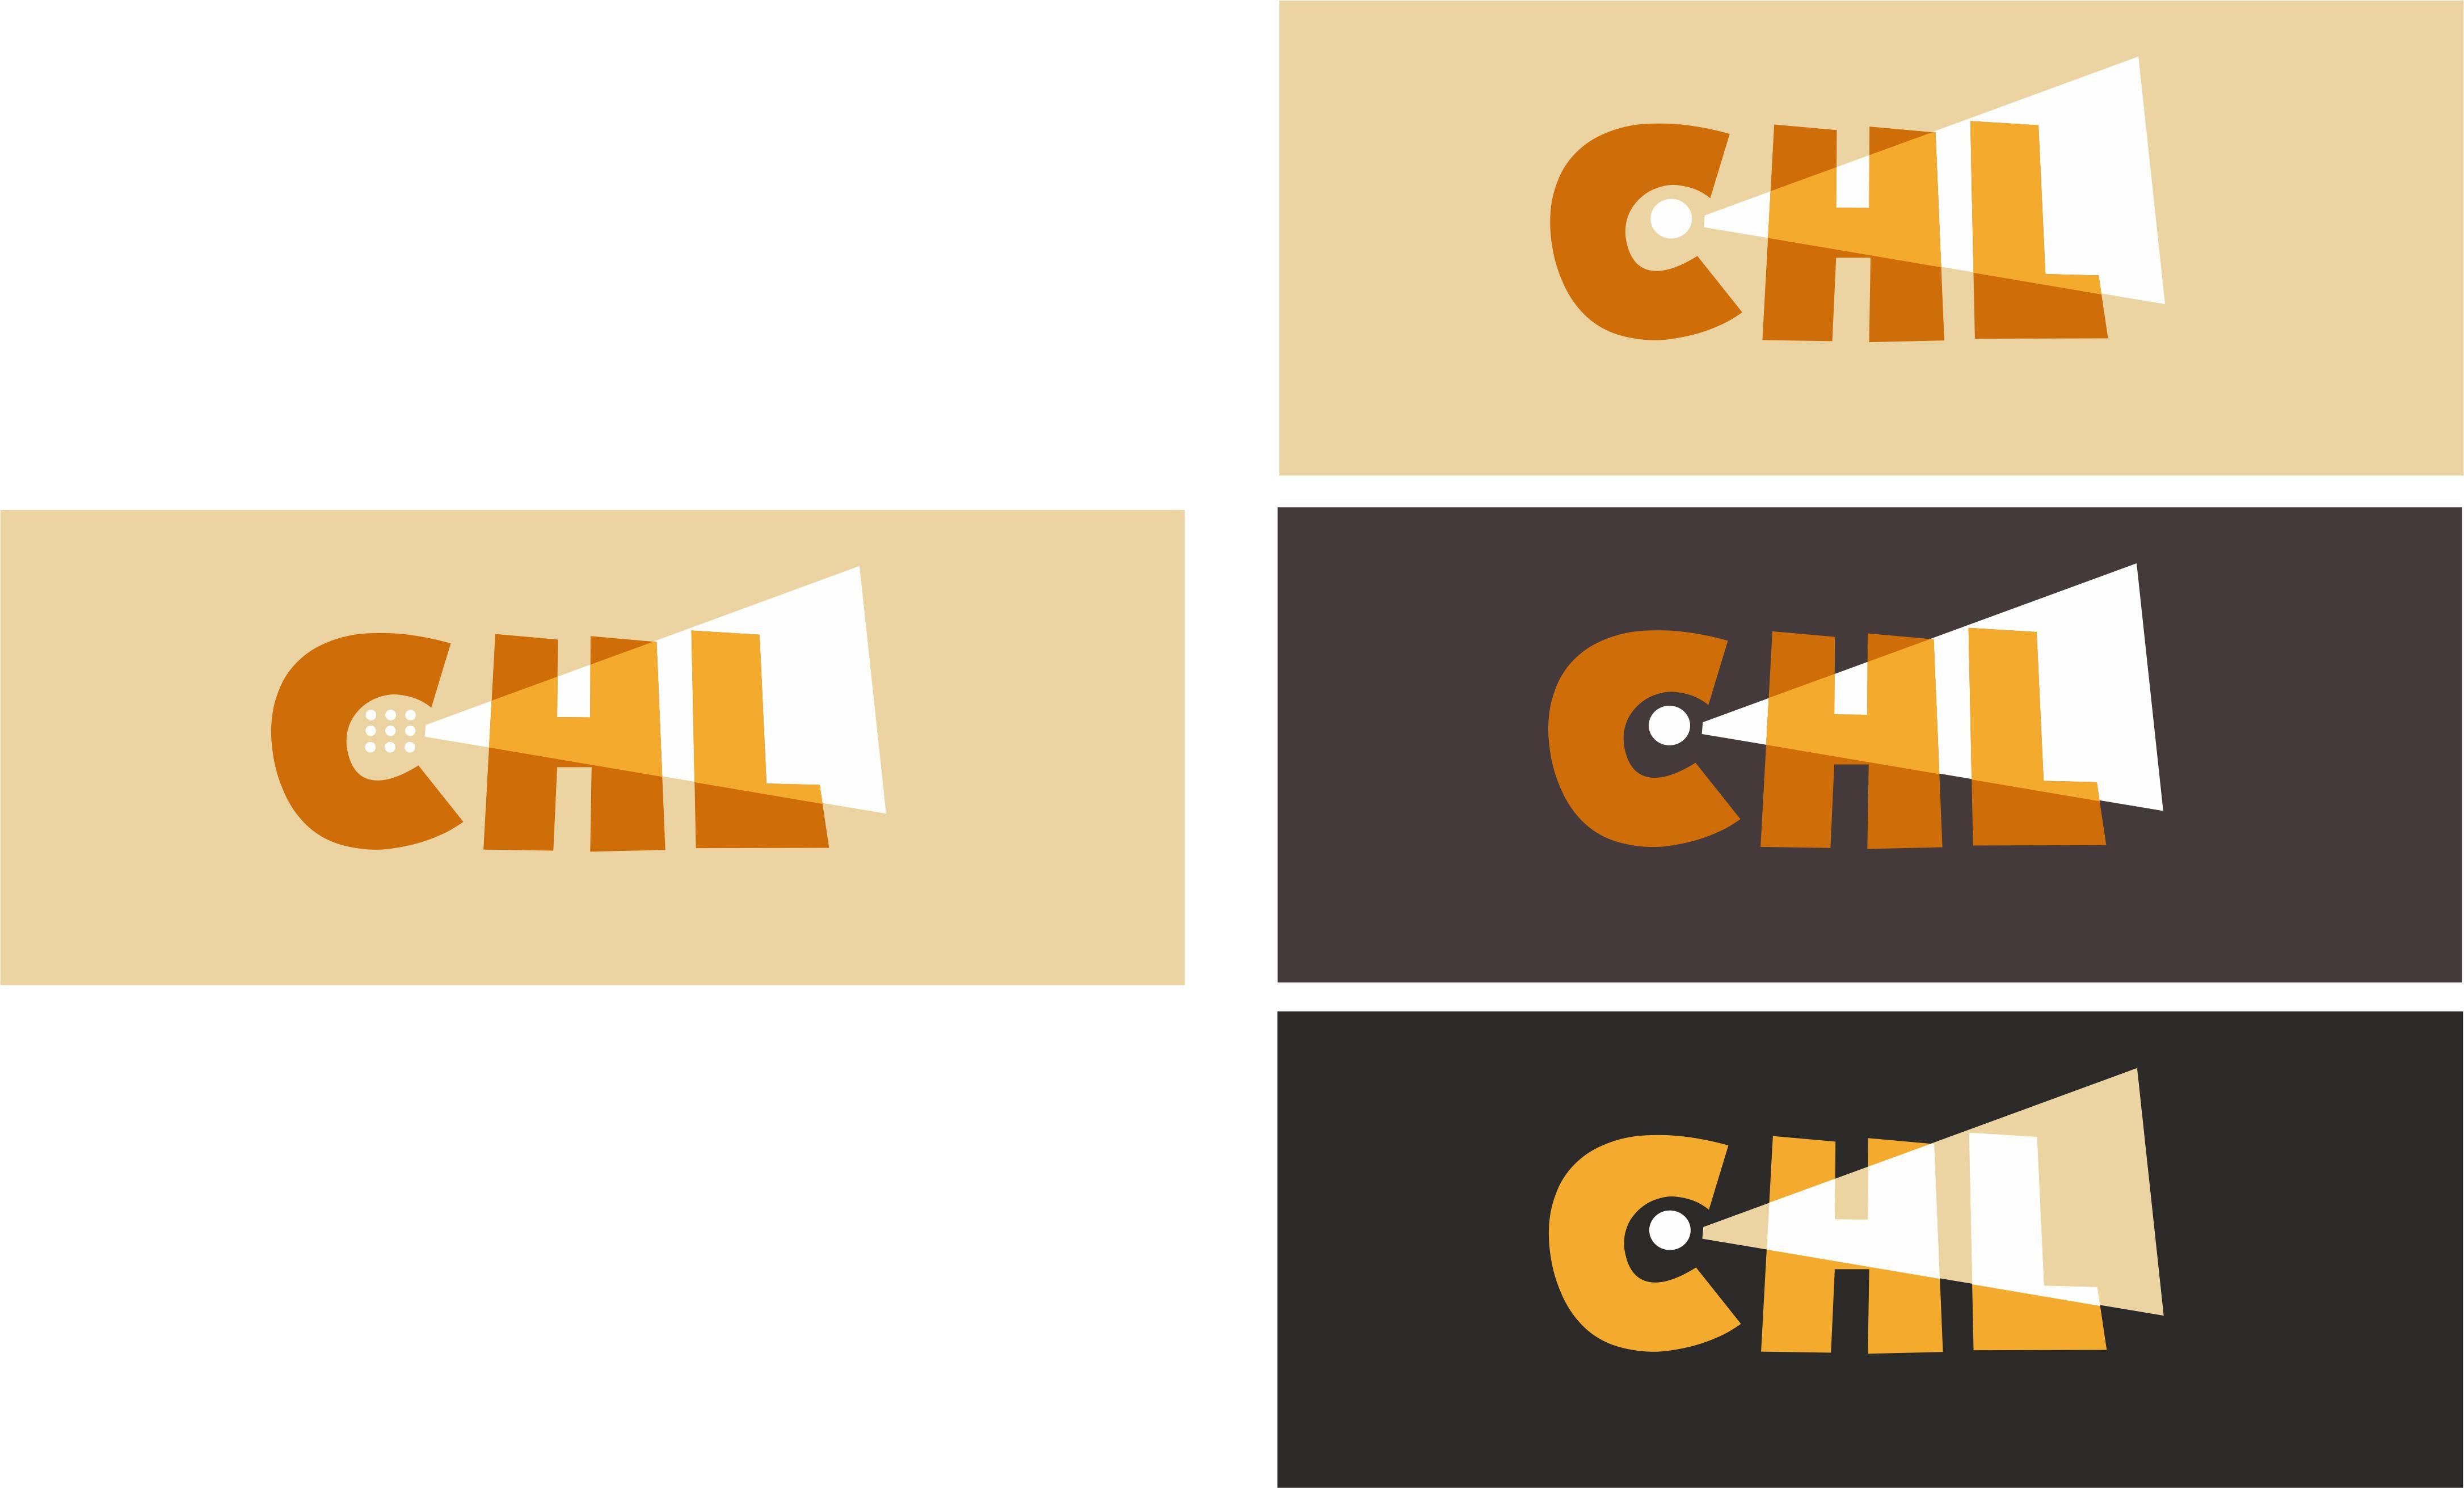 разработка логотипа для производителя фар фото f_7245f5a4938c7be2.jpg